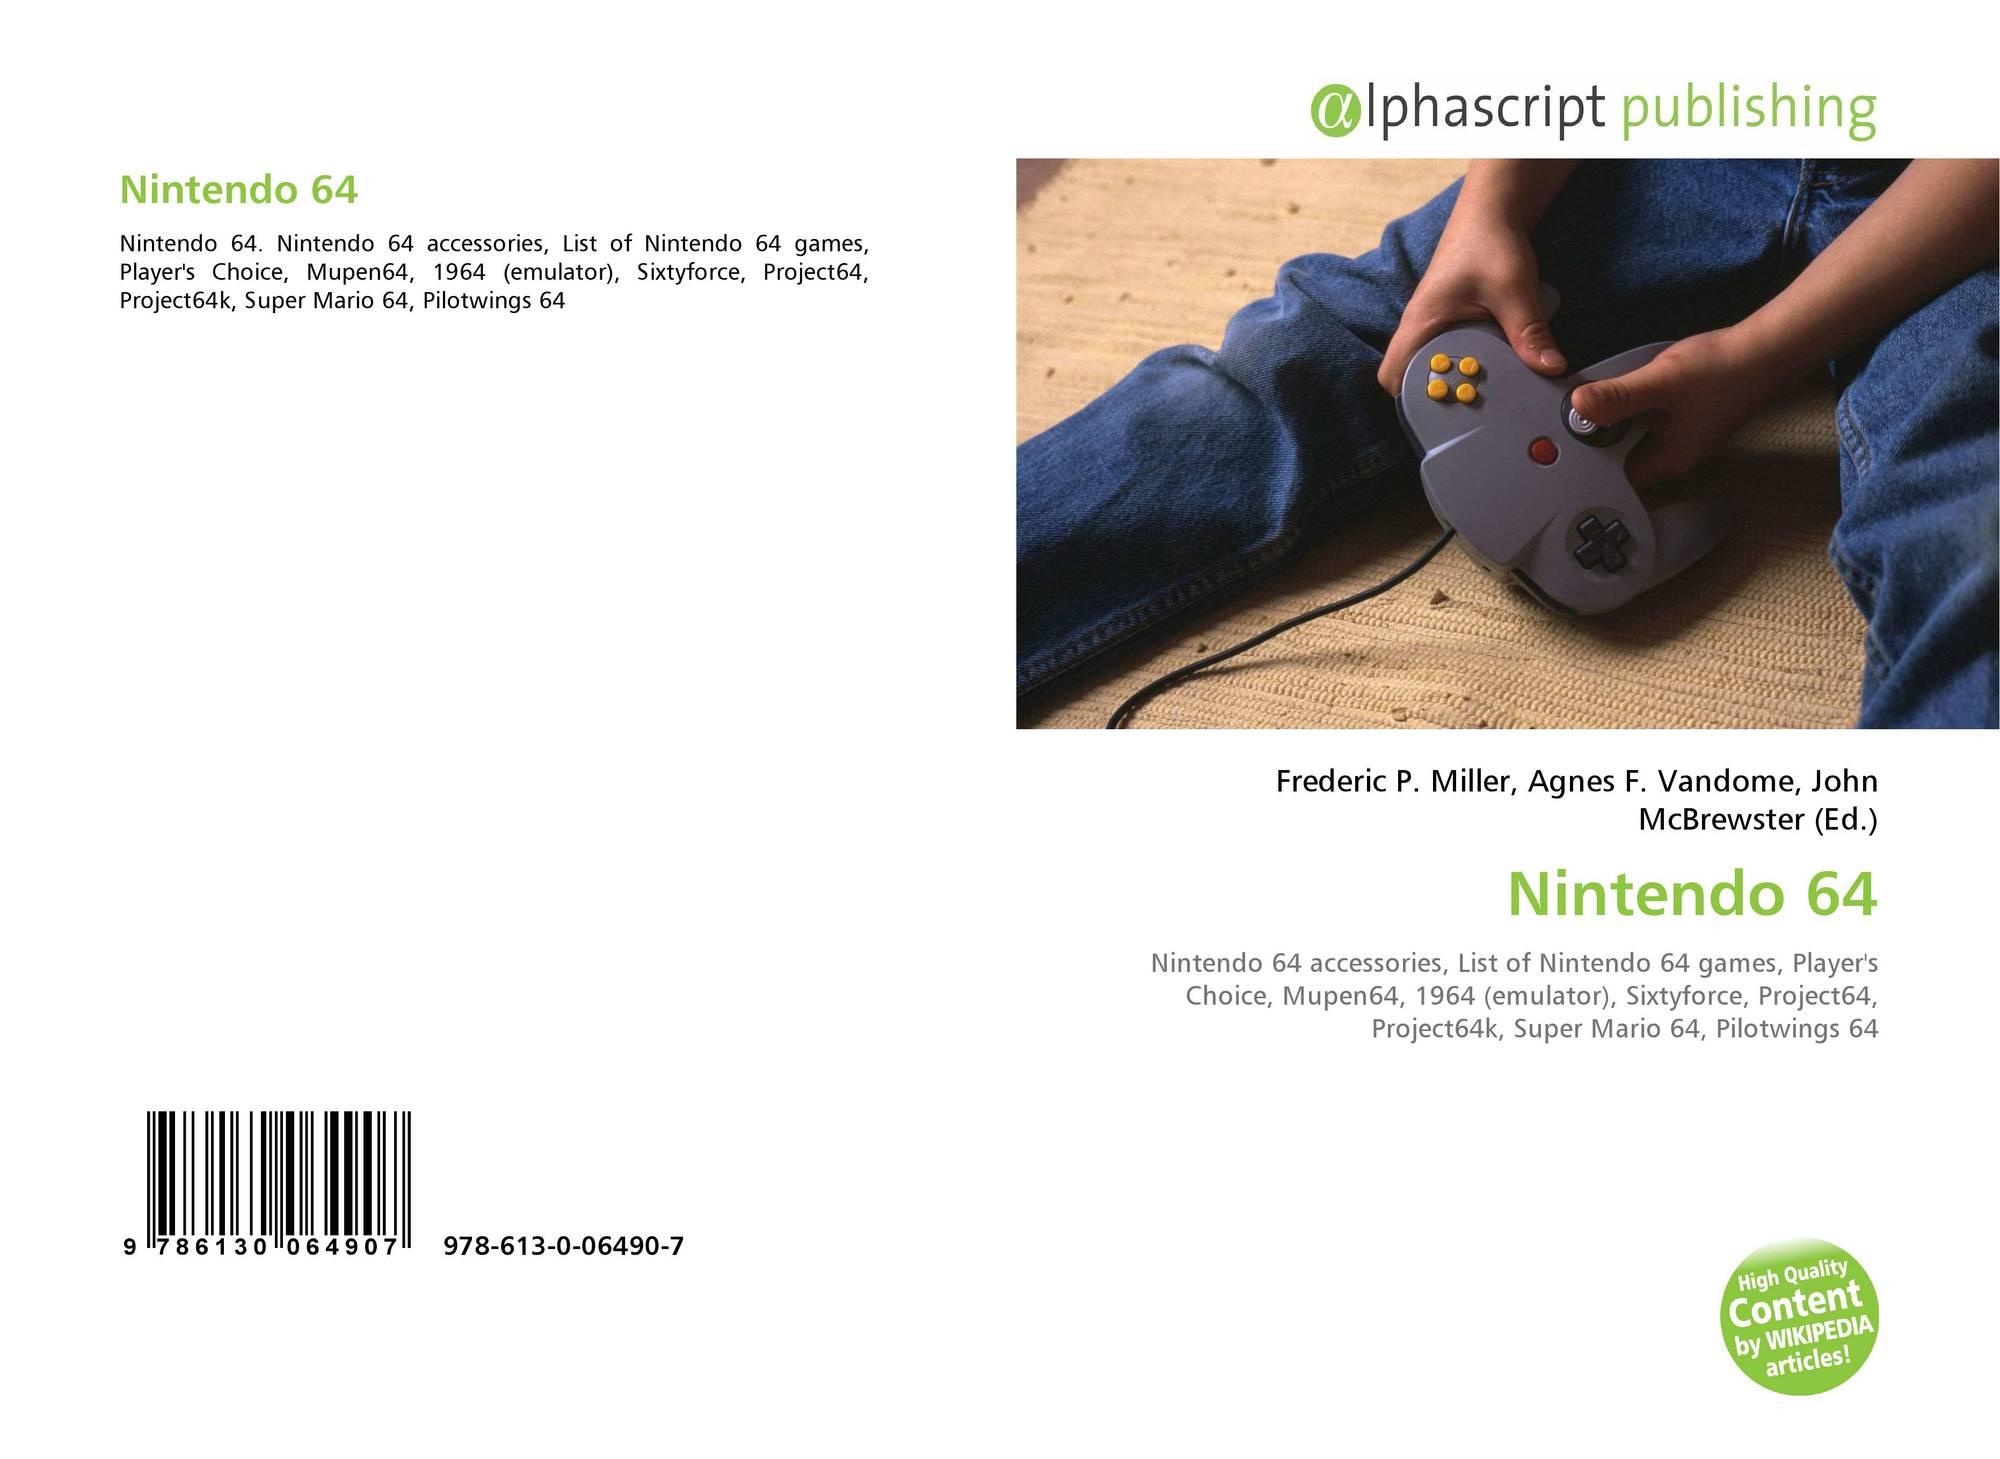 Nintendo 64, 978-613-0-06490-7, 613006490X ,9786130064907